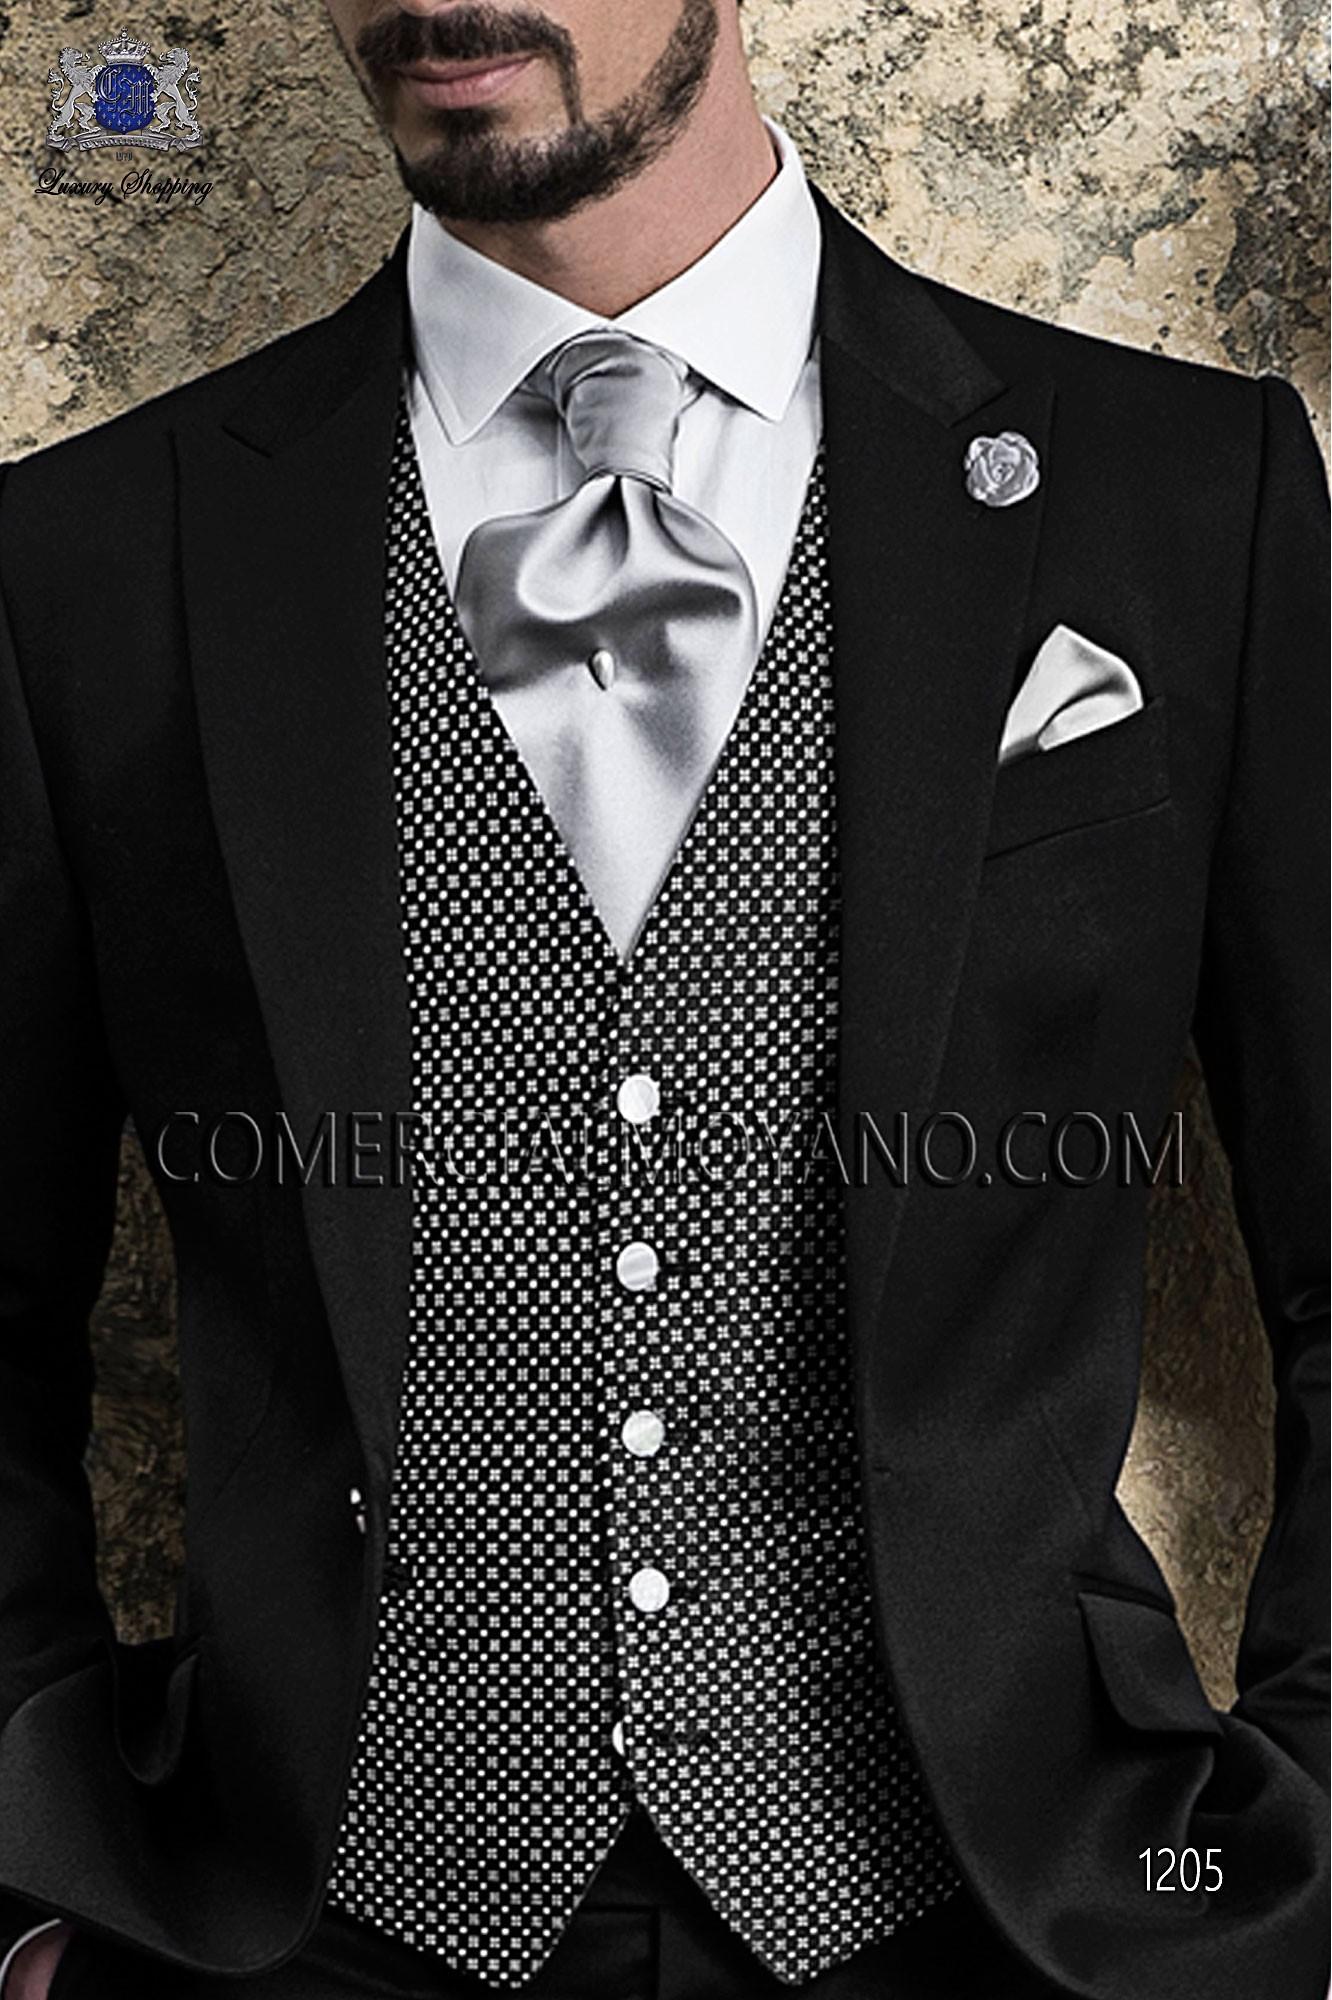 Italian gentleman black men wedding suit, model: 1205 Ottavio Nuccio Gala Gentleman Collection